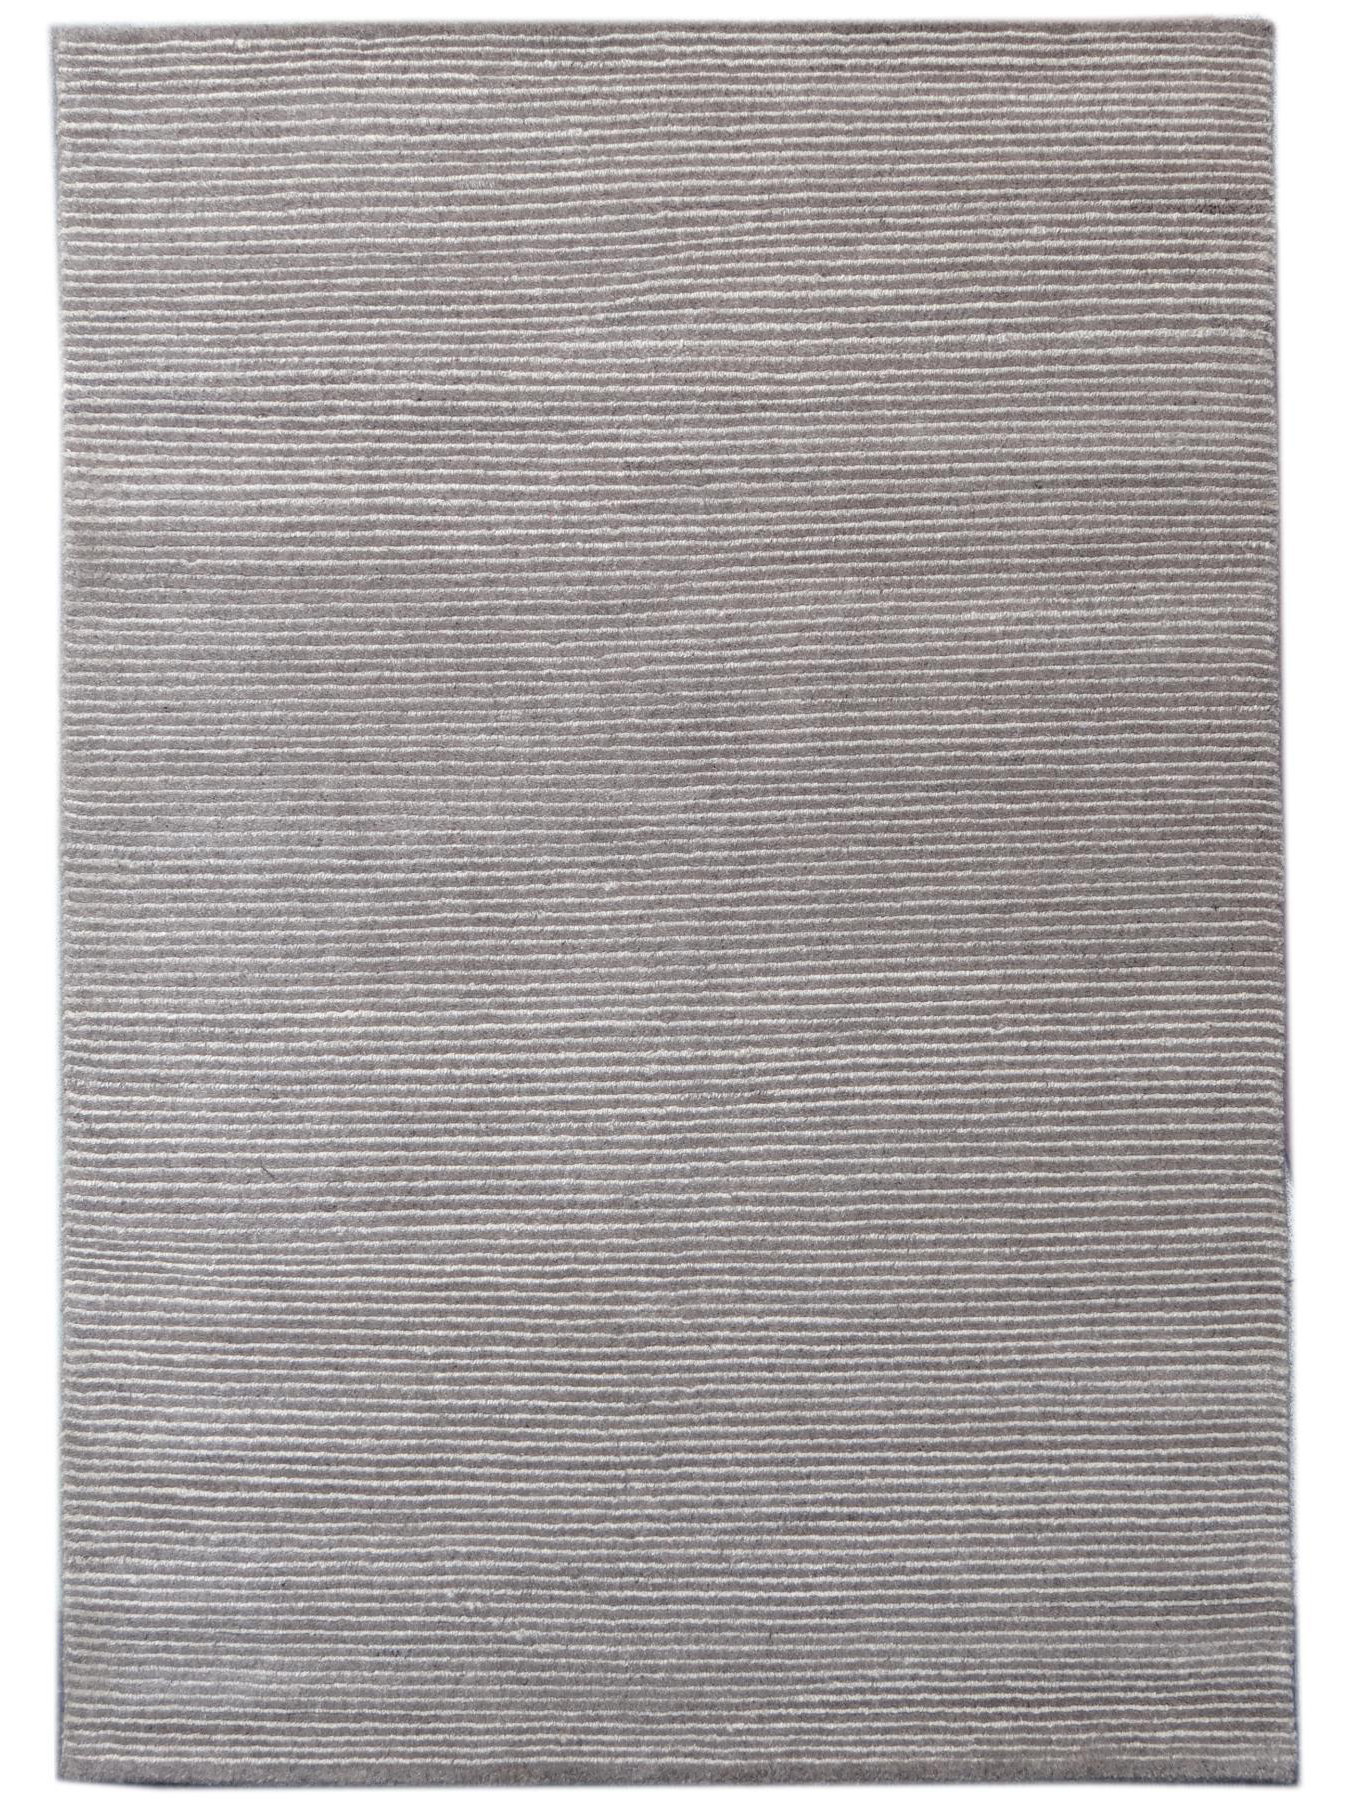 Chakia gris tapis design n 30258 300x250cm - Tapis 200x140 ...